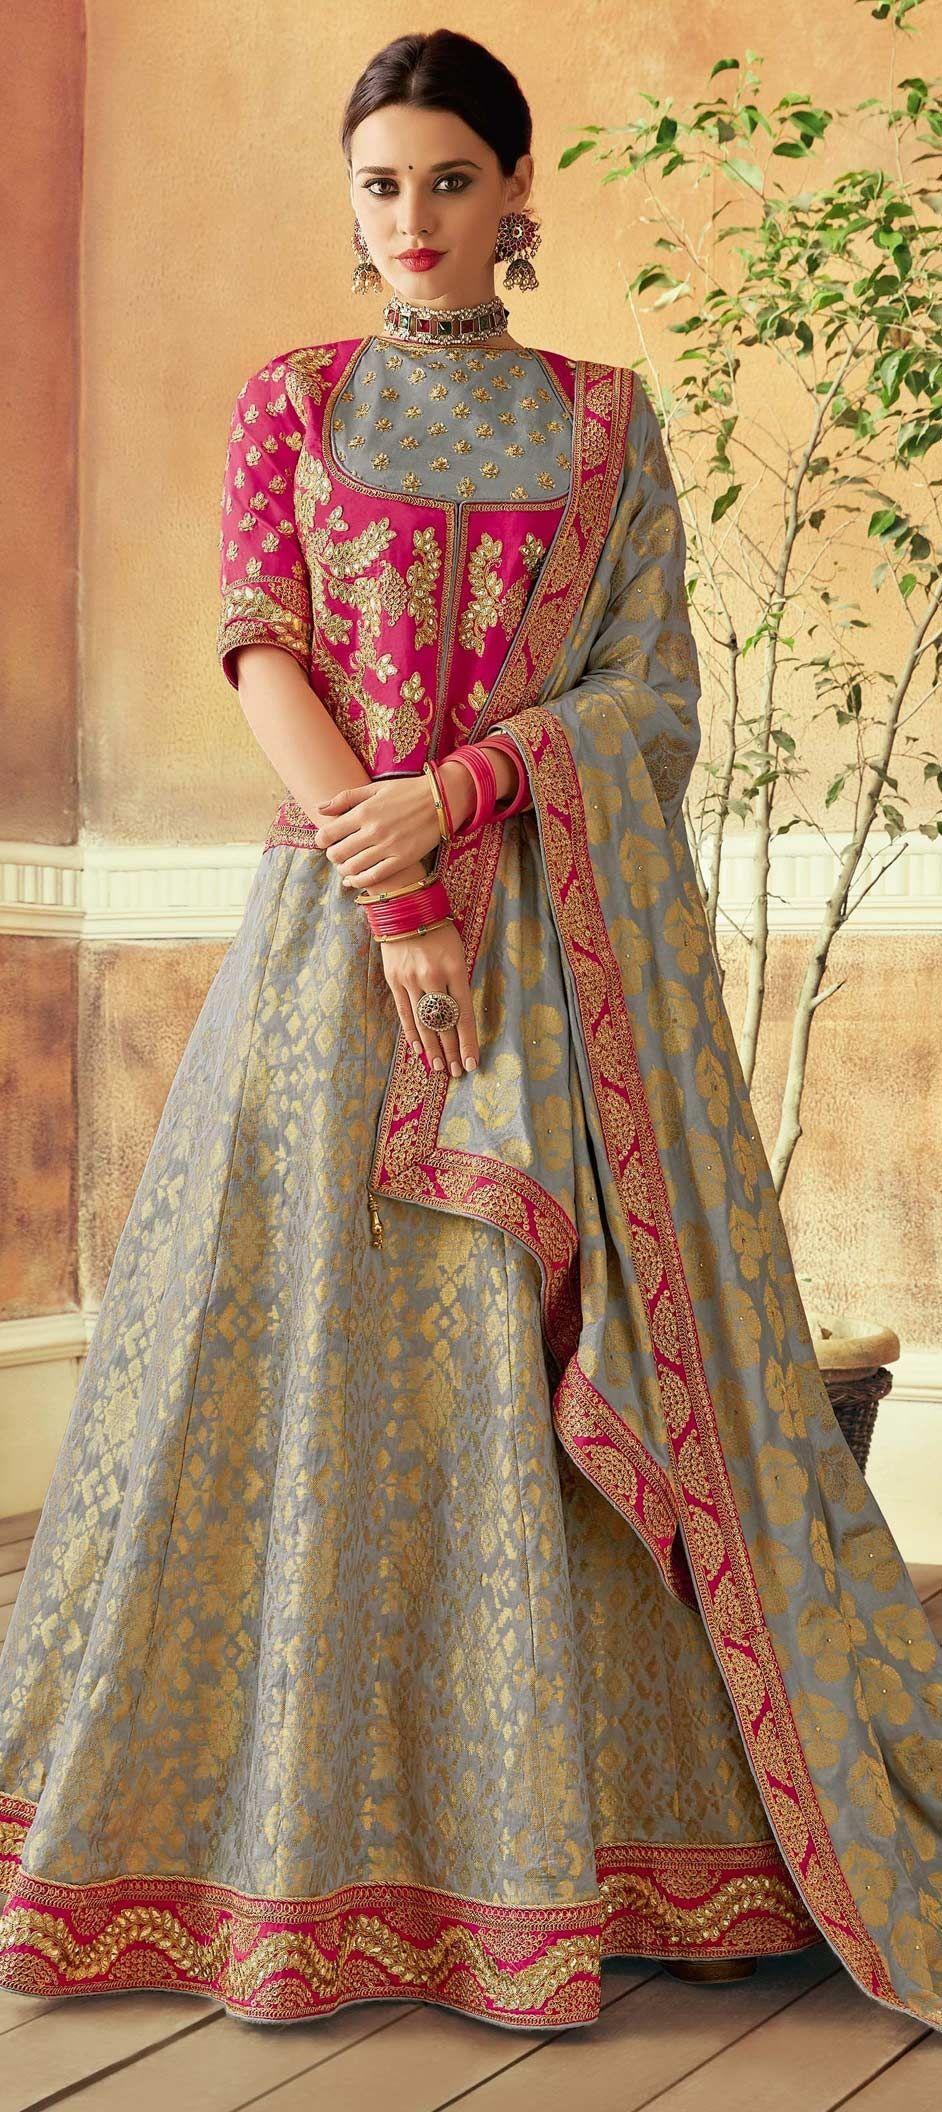 Mehndi sangeet lehenga: Get the Sizzling Look in the Trendy Styles